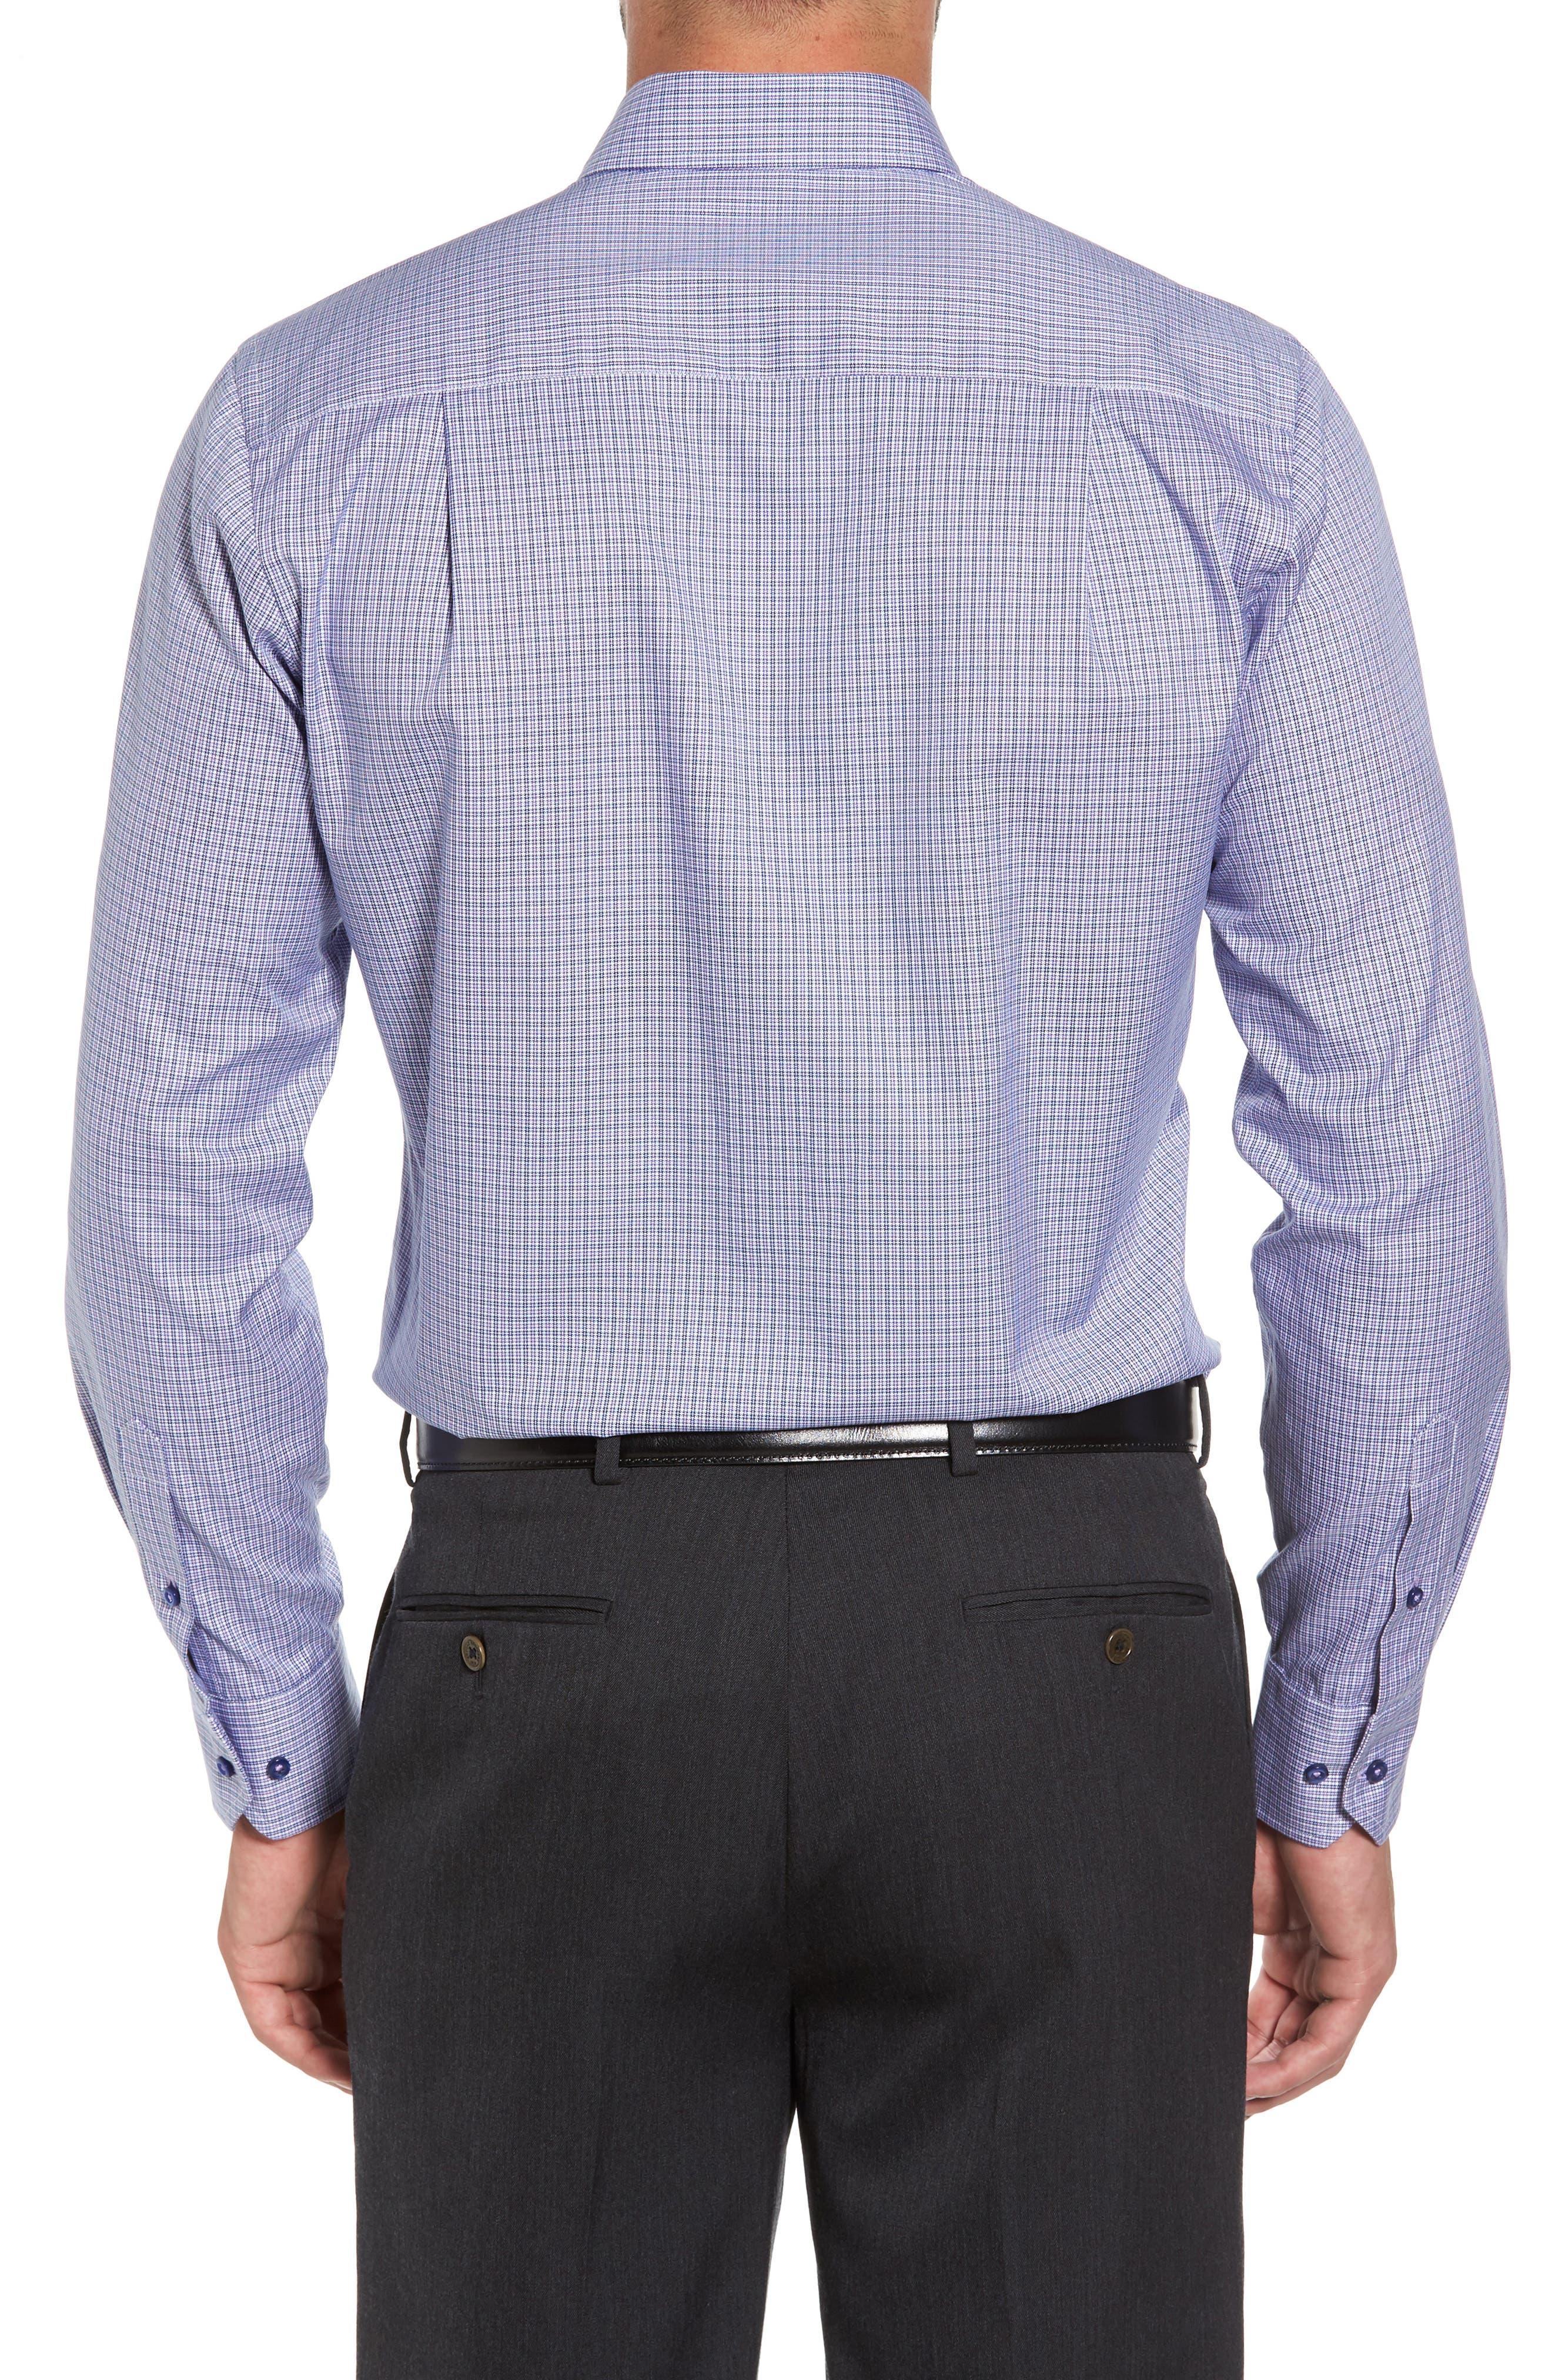 Microcheck Sport Shirt,                             Alternate thumbnail 2, color,                             431